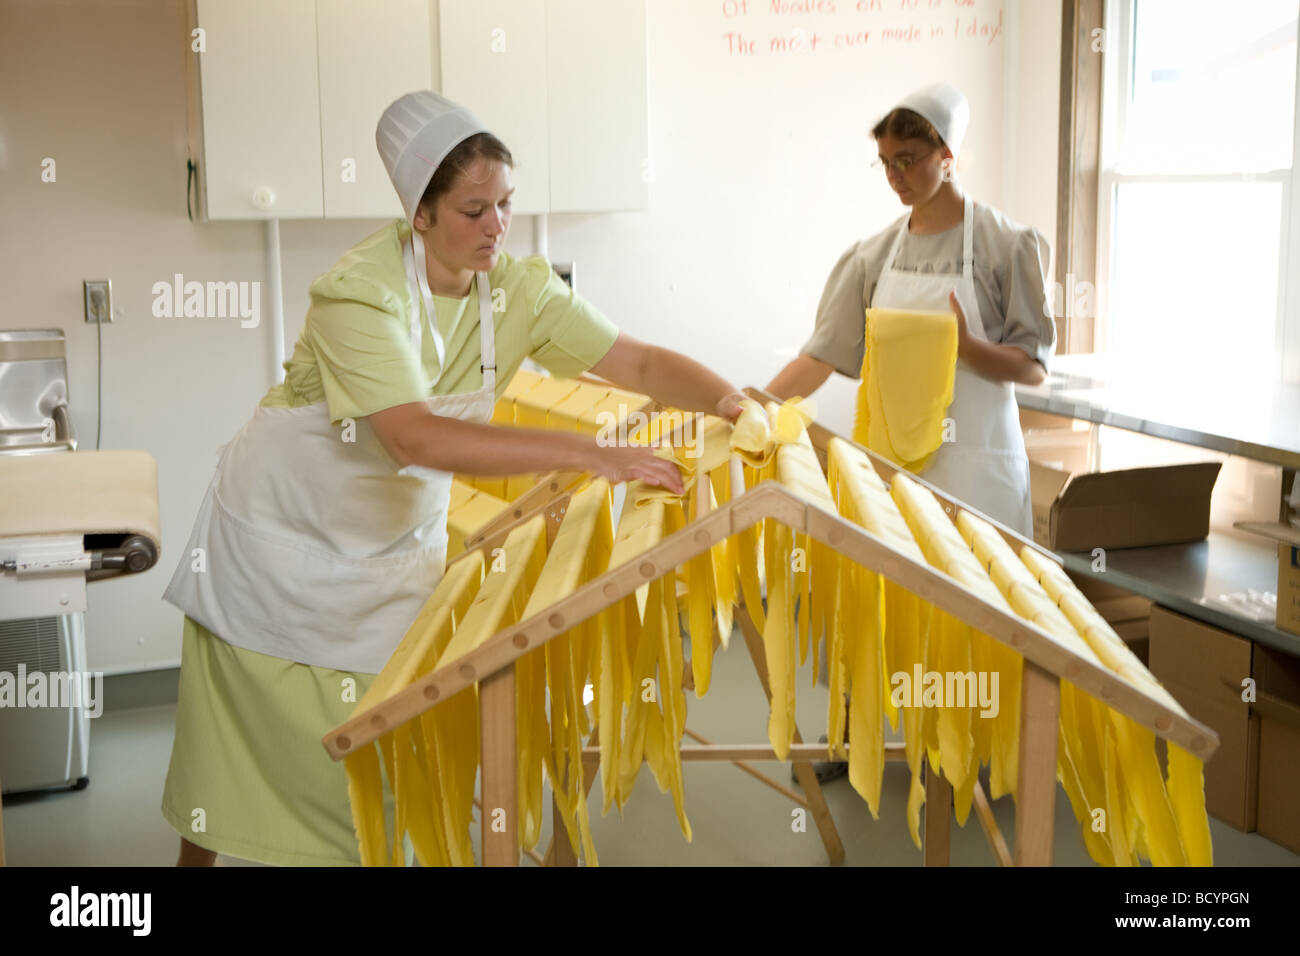 Amish women making egg noodles in Middlebury Indiana - Stock Image